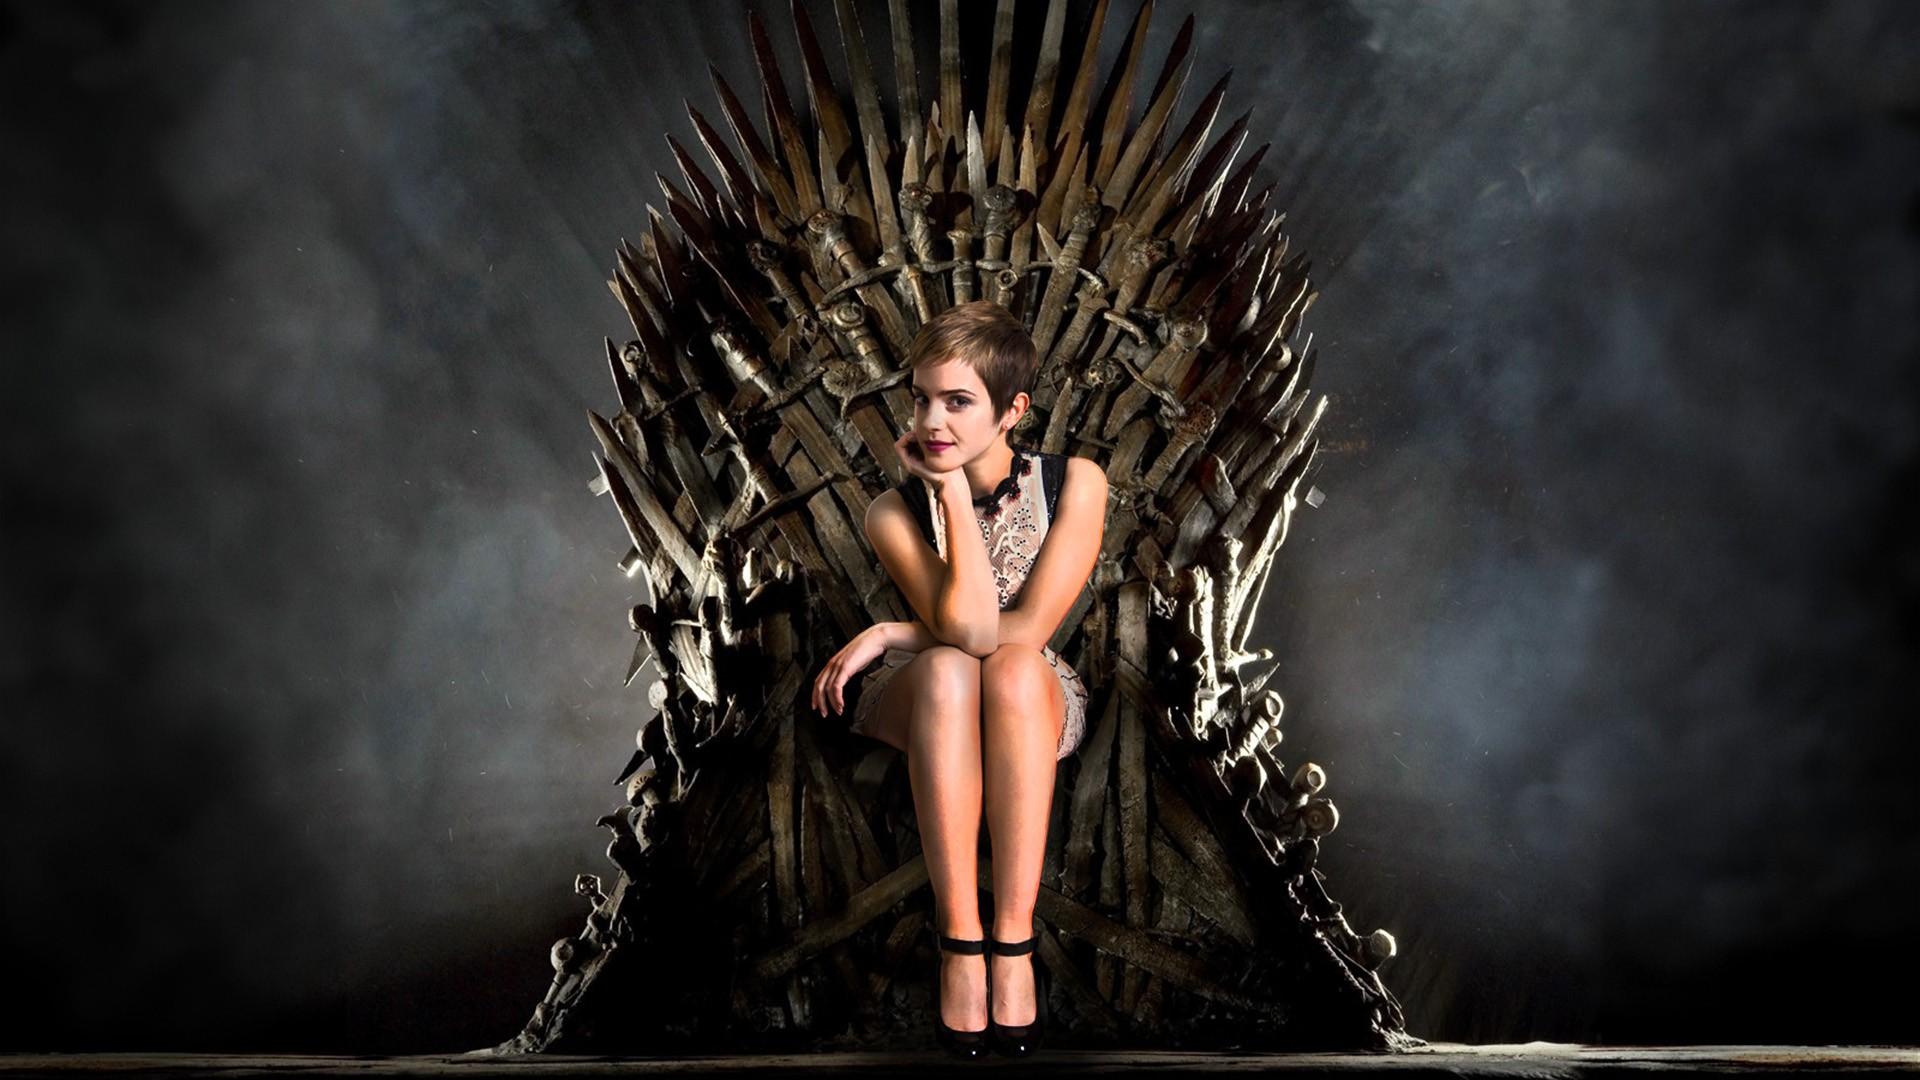 Game of Thrones Season 5 HD Wallpapers 1080p Download Desktop 1920x1080